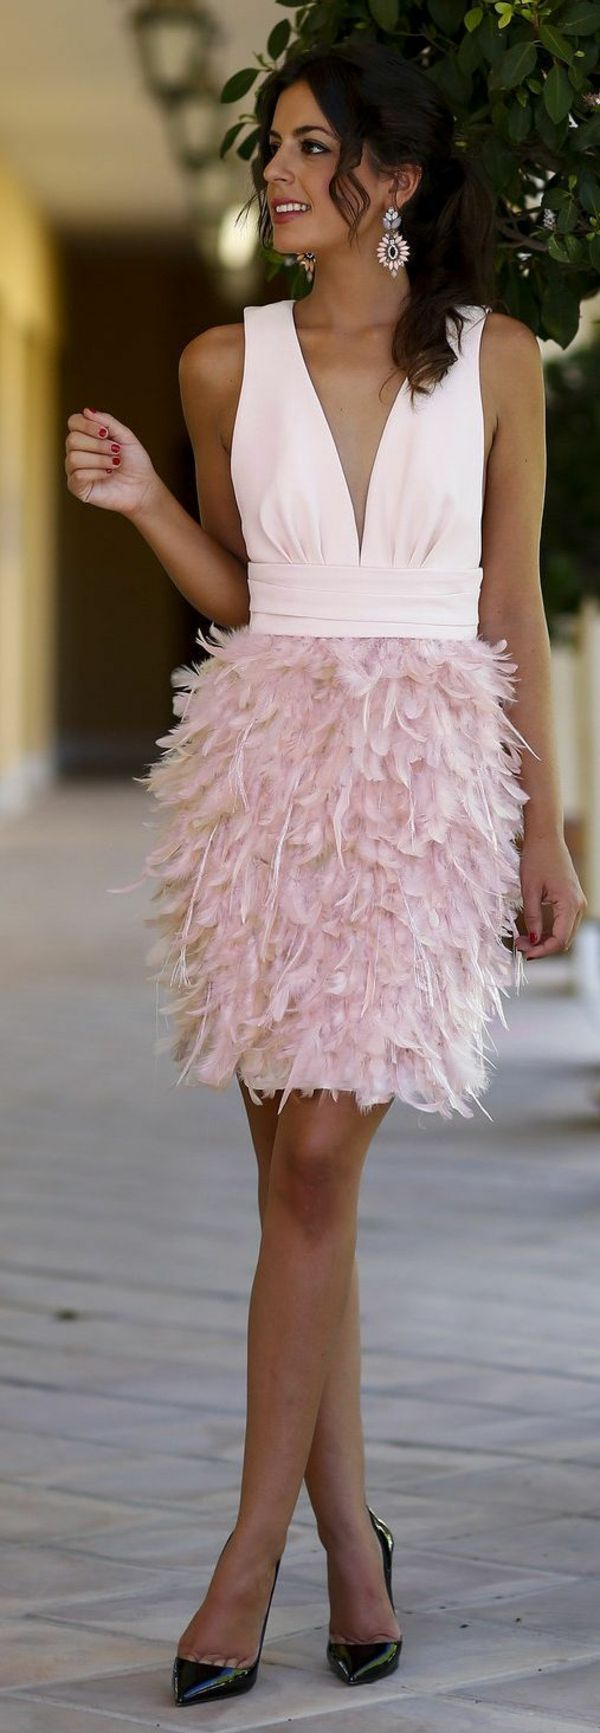 haute couture rosa knielänge dresscode